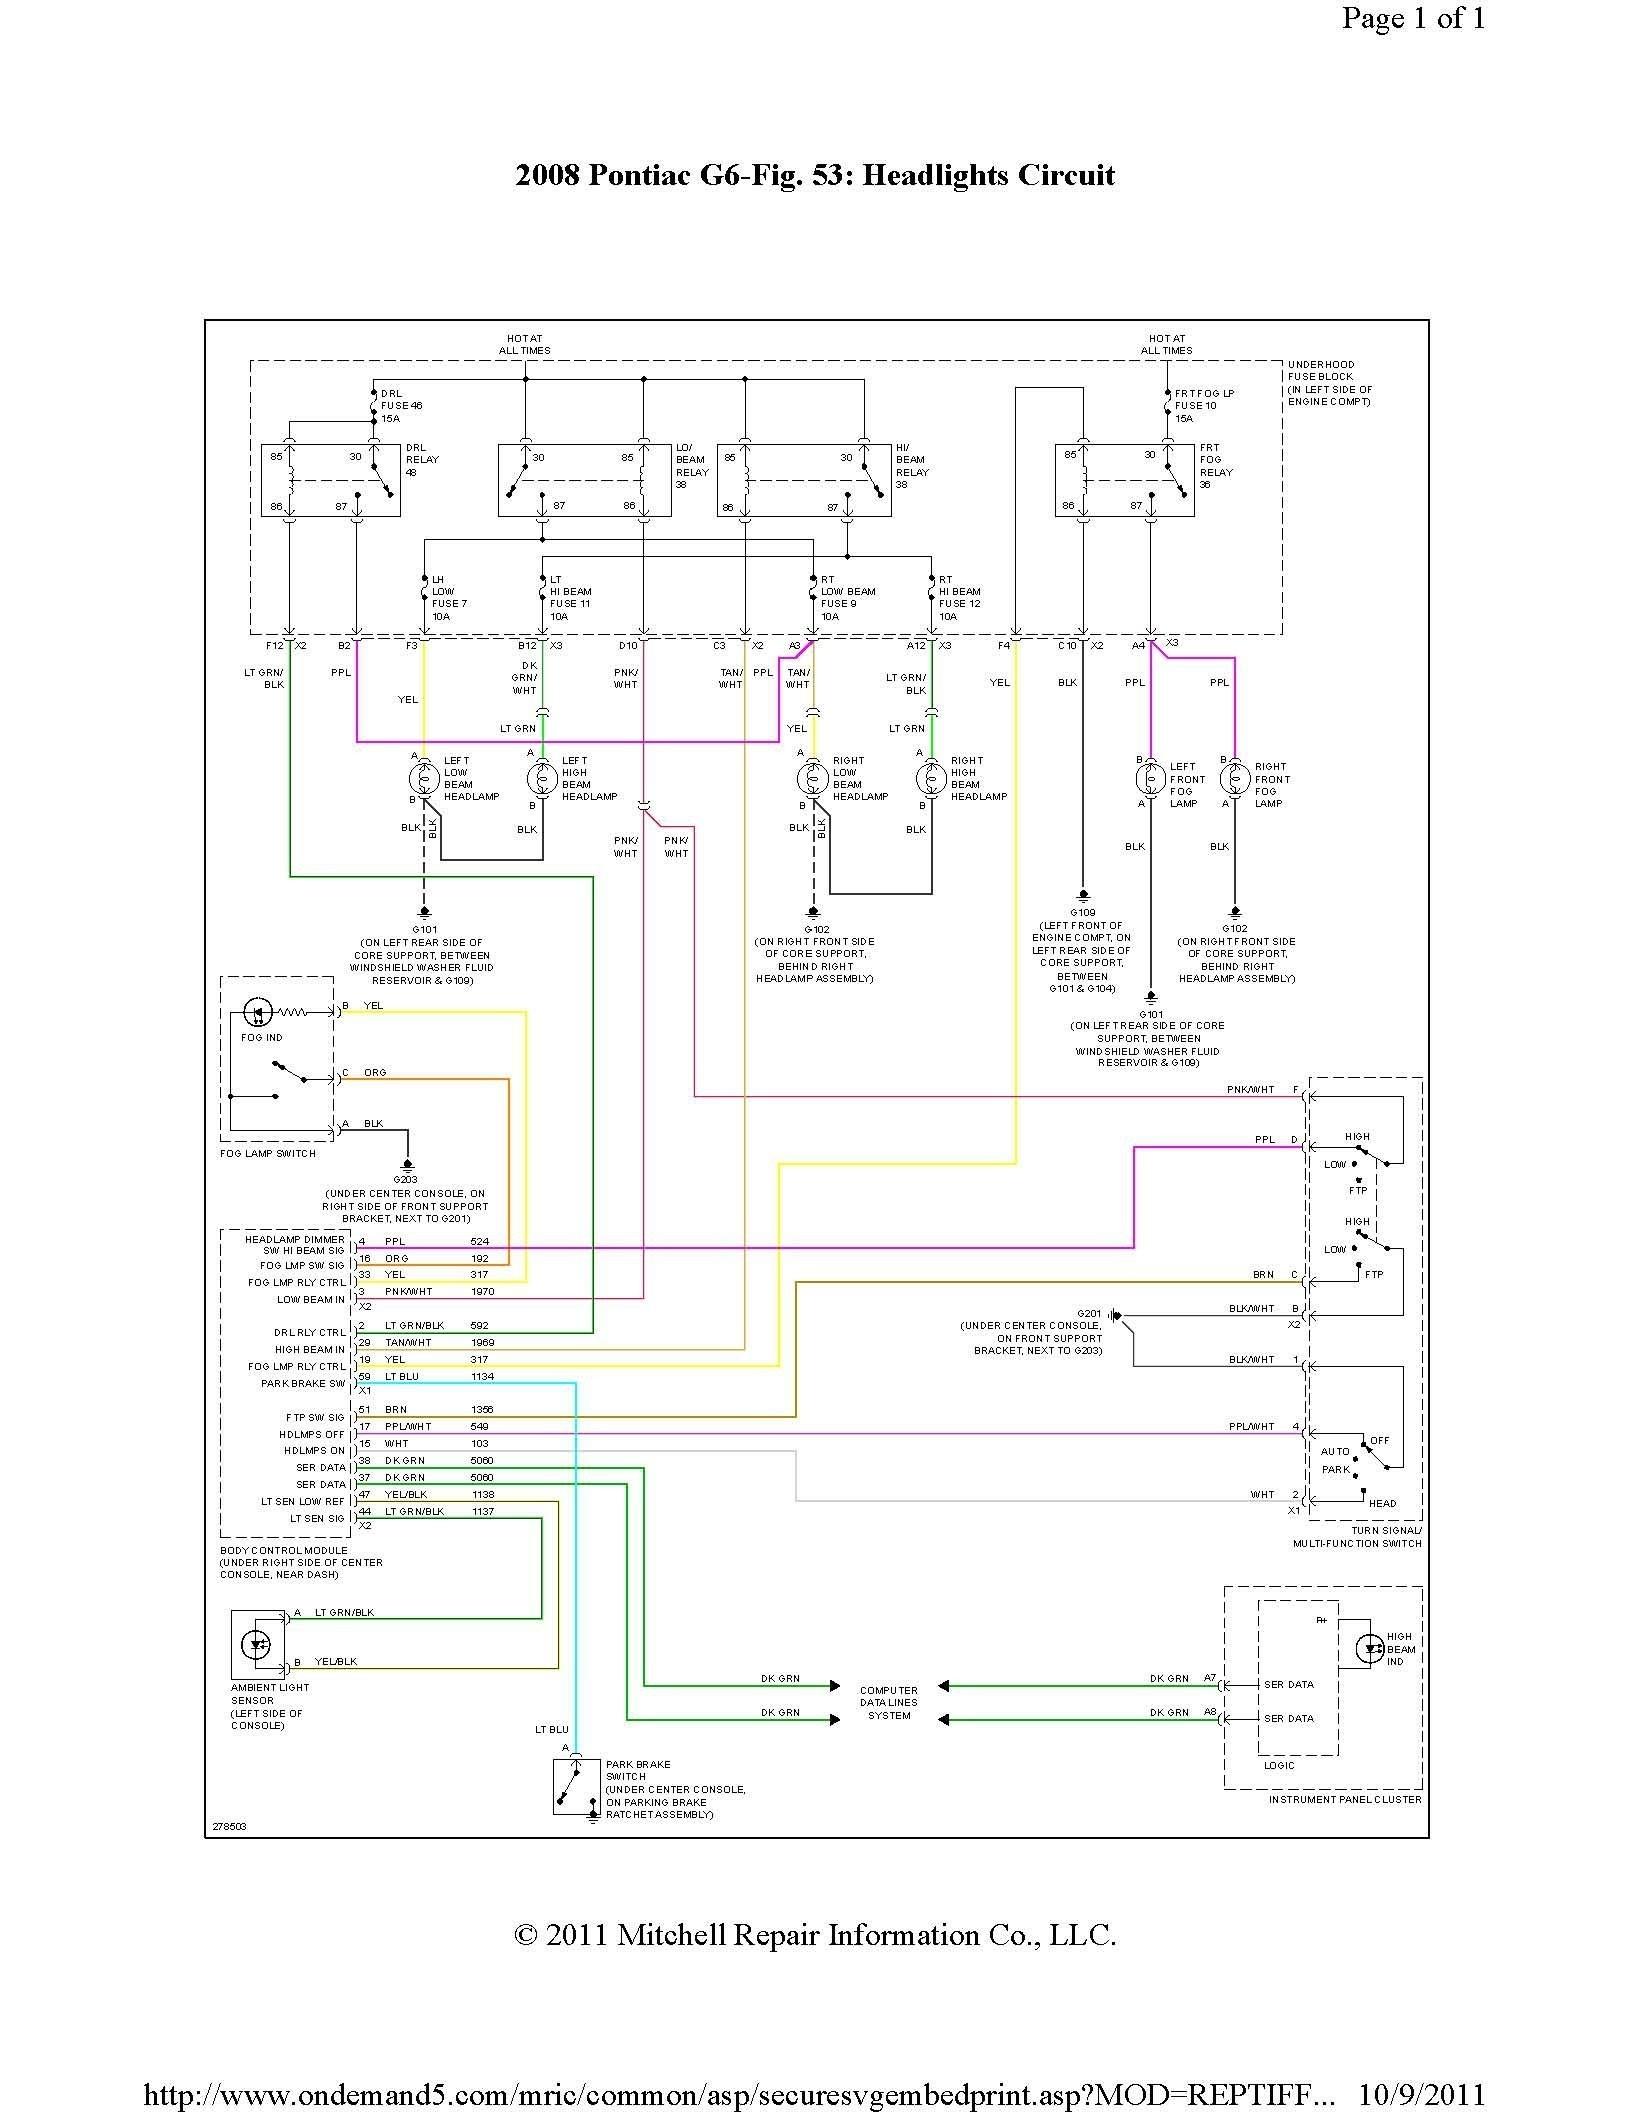 2007 Pontiac G6 Wiring Diagram 2006 Pontiac G6 Stereo Wiring Diagram Worksheet and Wiring Diagram • Of 2007 Pontiac G6 Wiring Diagram